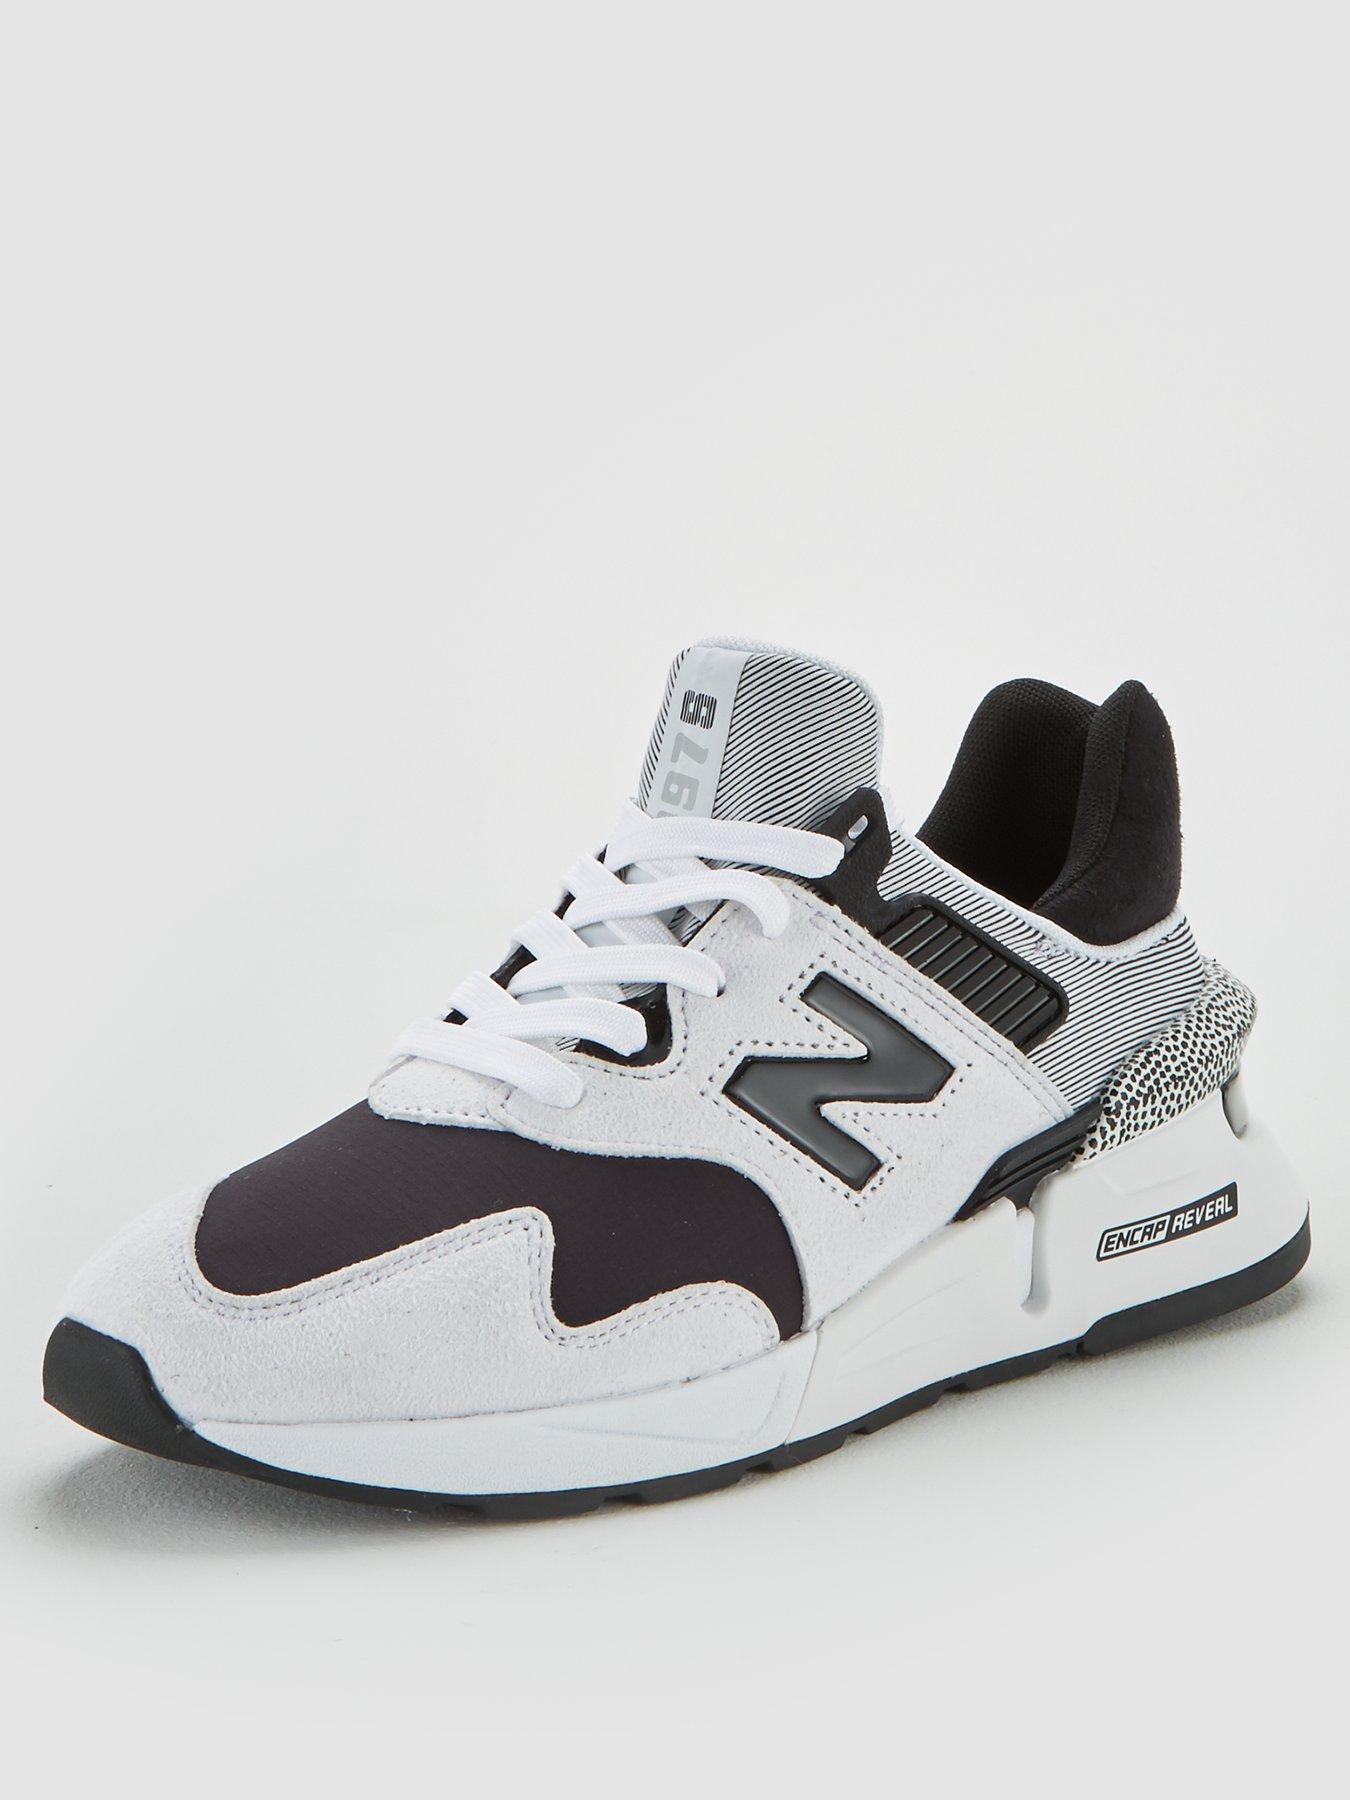 new balance 997 leather